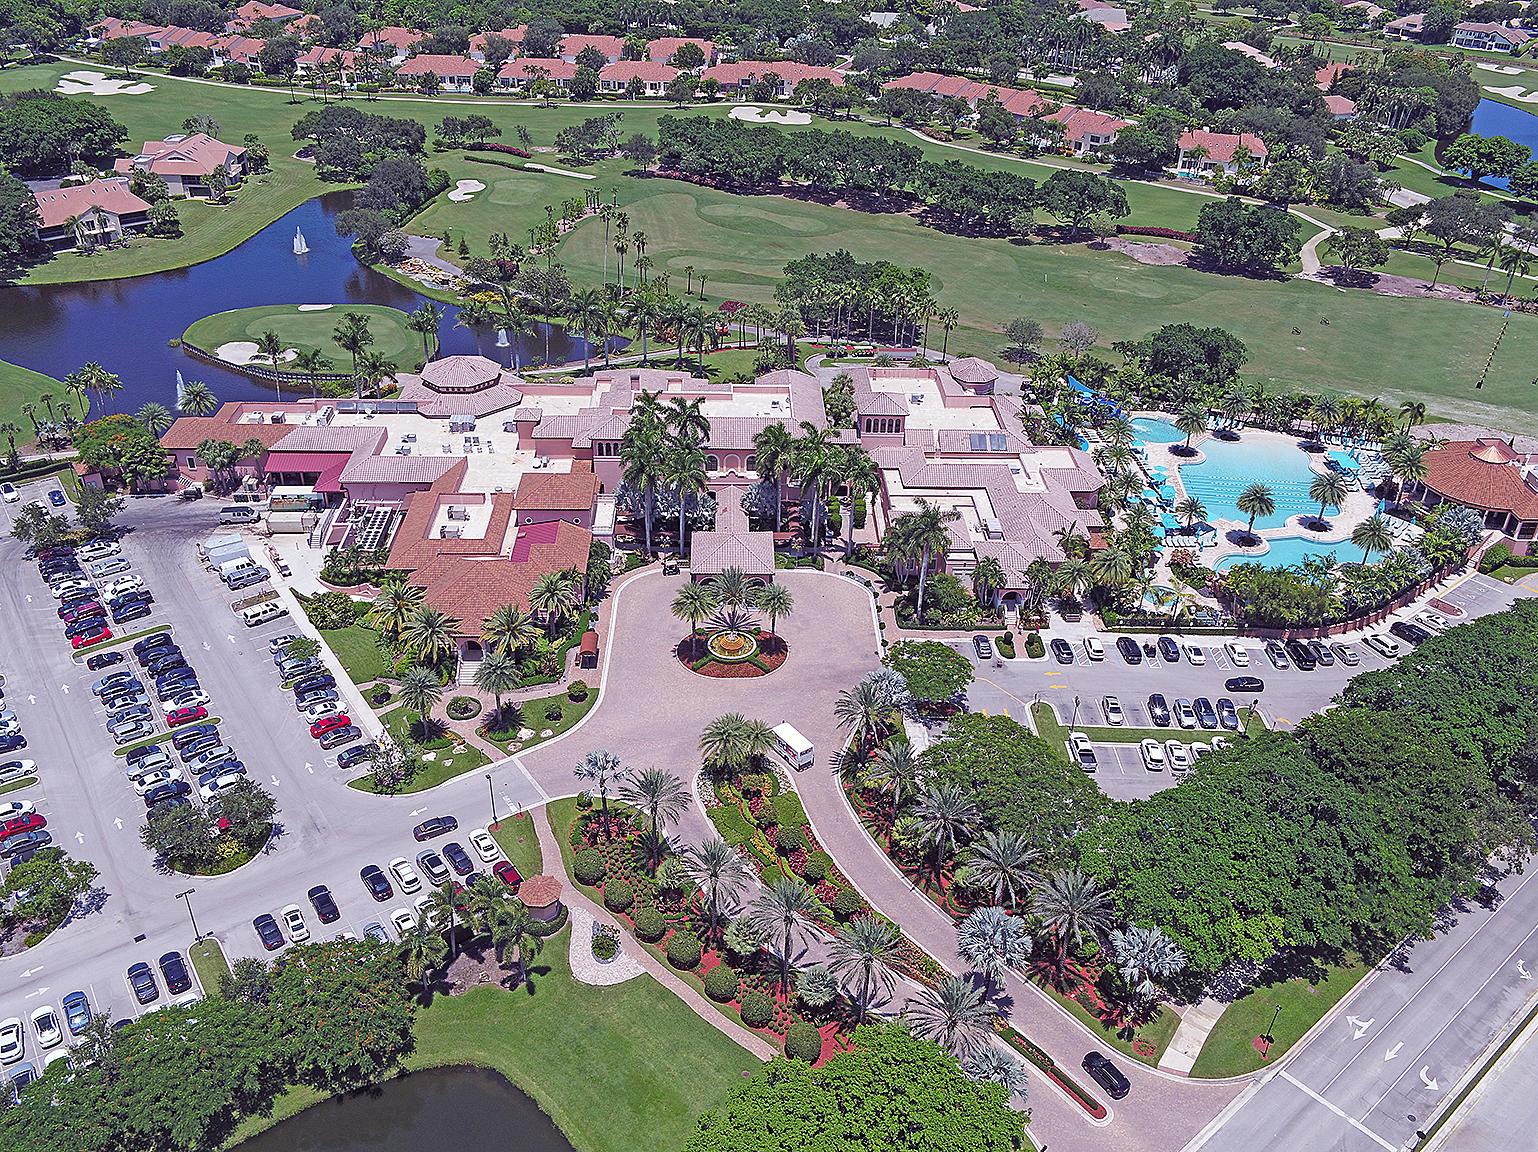 2491 59th Street, Boca Raton, Florida 33496, 3 Bedrooms Bedrooms, ,2 BathroomsBathrooms,Residential,for Rent,BROKEN SOUND,59th,RX-10643406, , , ,for Rent